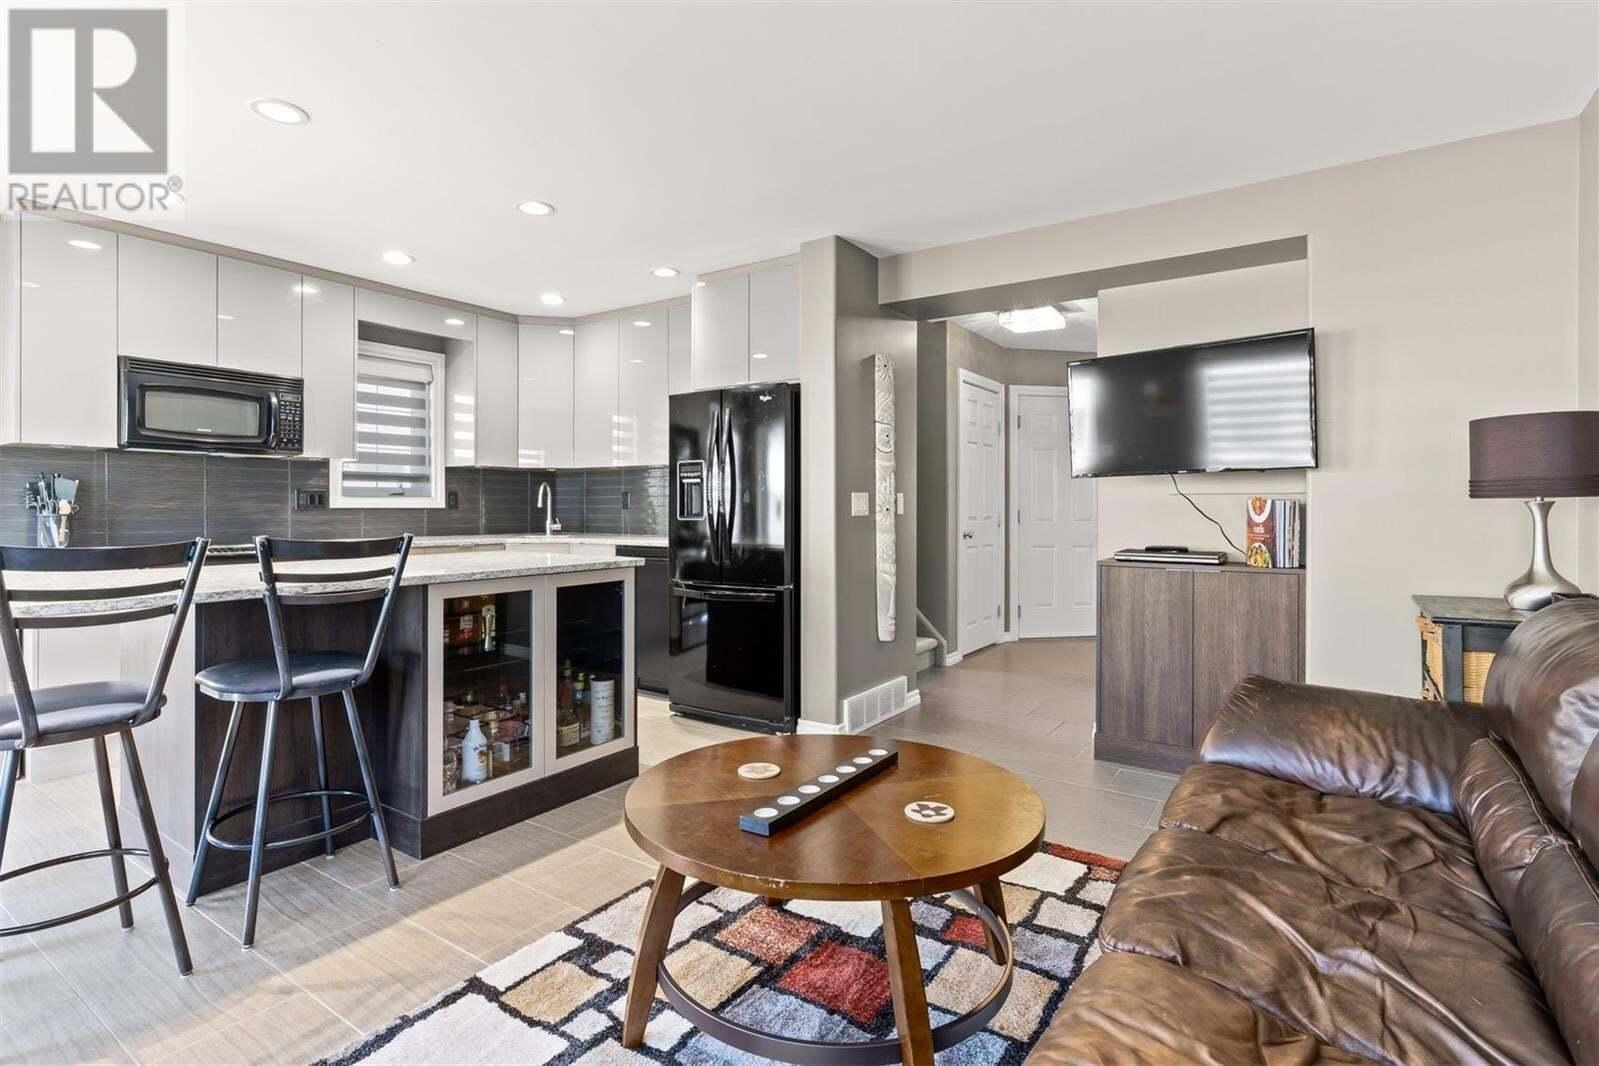 Townhouse for sale at 3101 Tregarva Dr E Unit 27 Regina Saskatchewan - MLS: SK819441